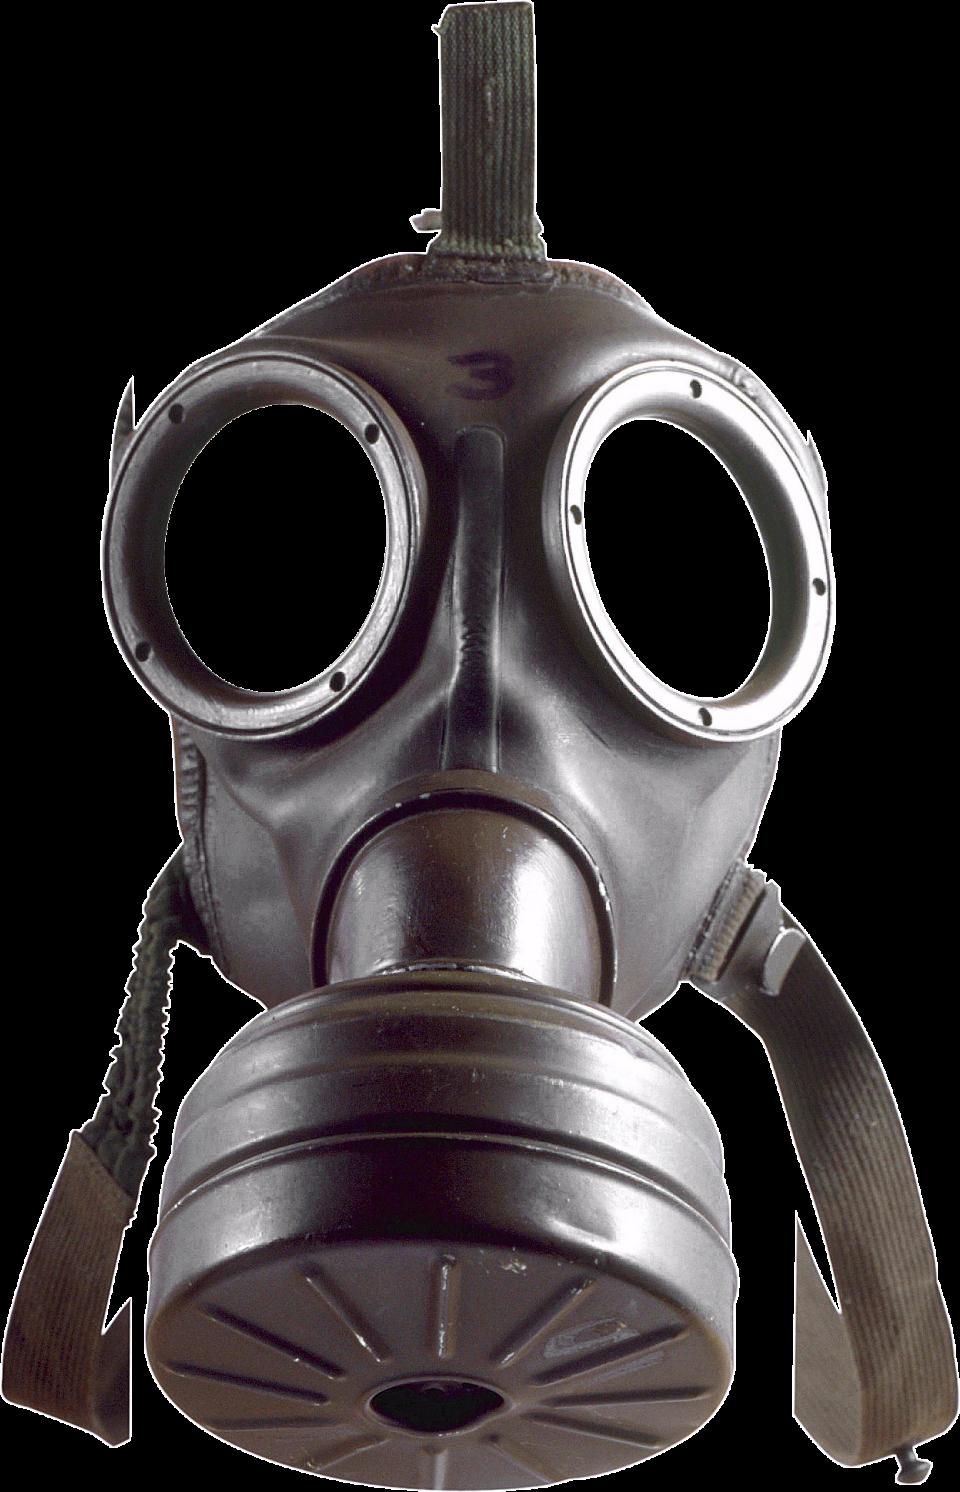 Gas Mask PNG Image - PurePNG | Free transparent CC0 PNG ...